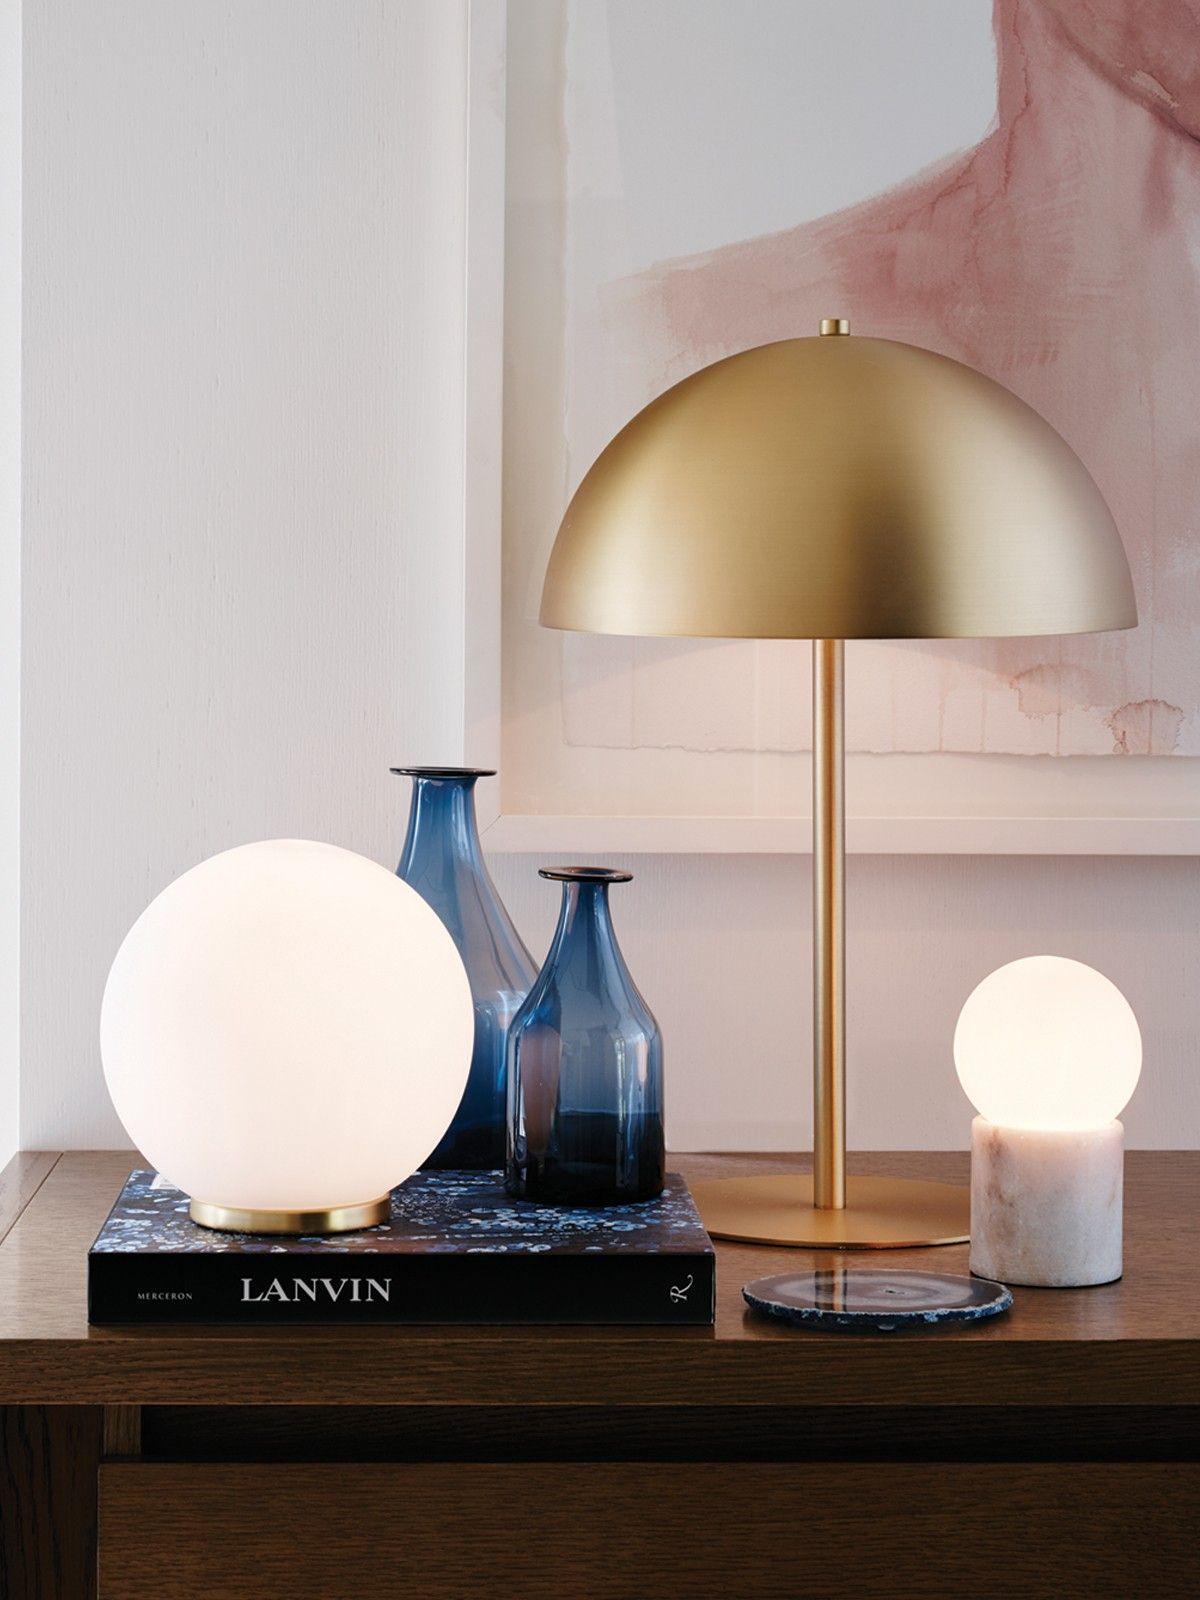 Pin by Zainab Ezzeddine on lighting ideas Round table